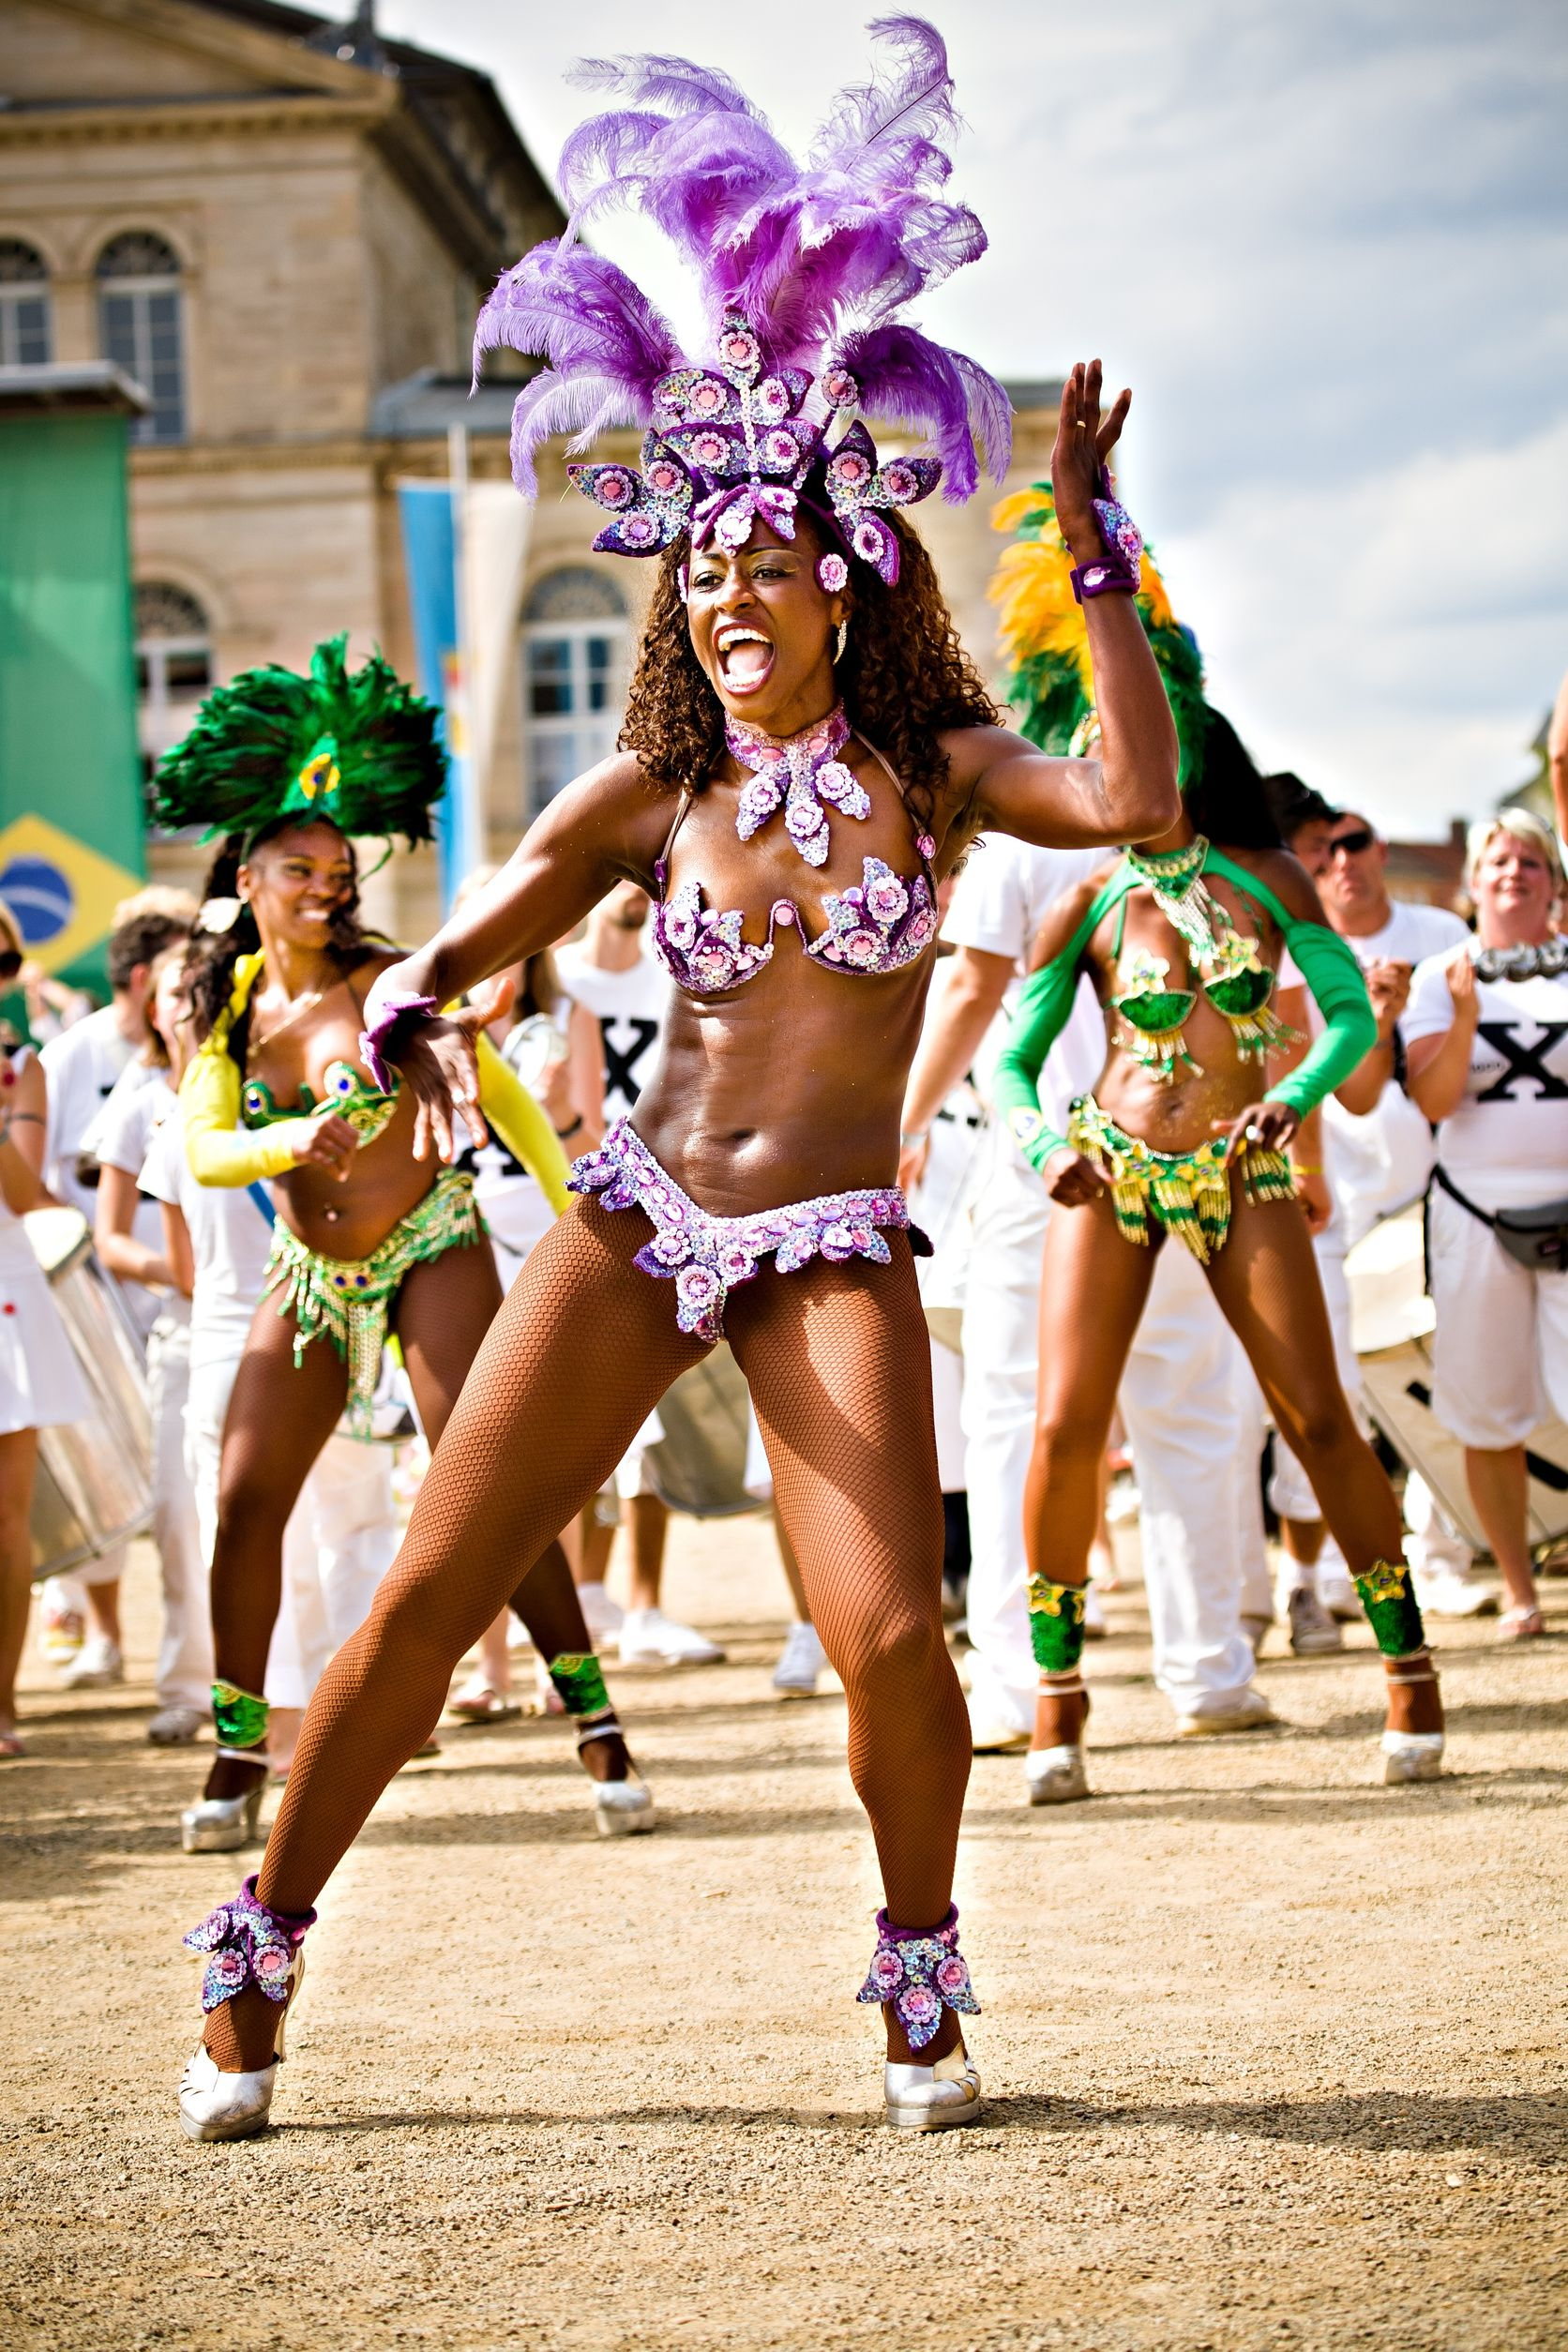 Brazil - Page 6 Samba-dancer-participates-at-the-annual-Samba-Festival-in-Coburg-Germany